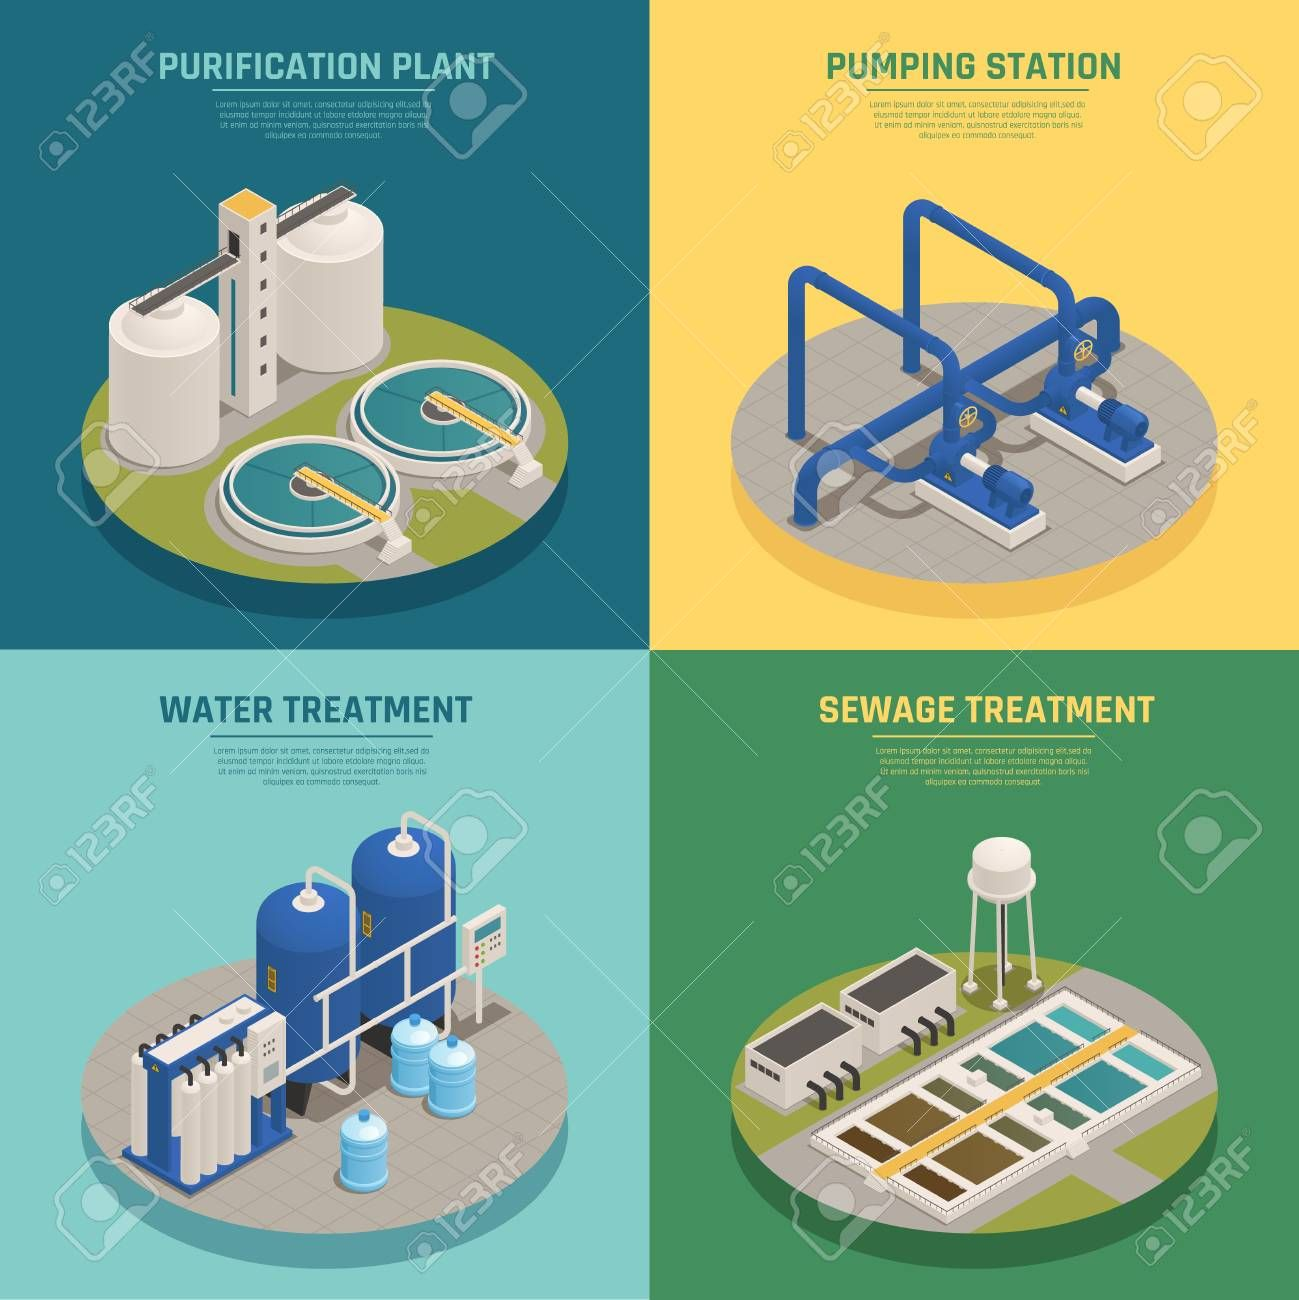 Water Clarifier Tank Icon Google Search Wastewater Water Treatment Water Treatment Plant